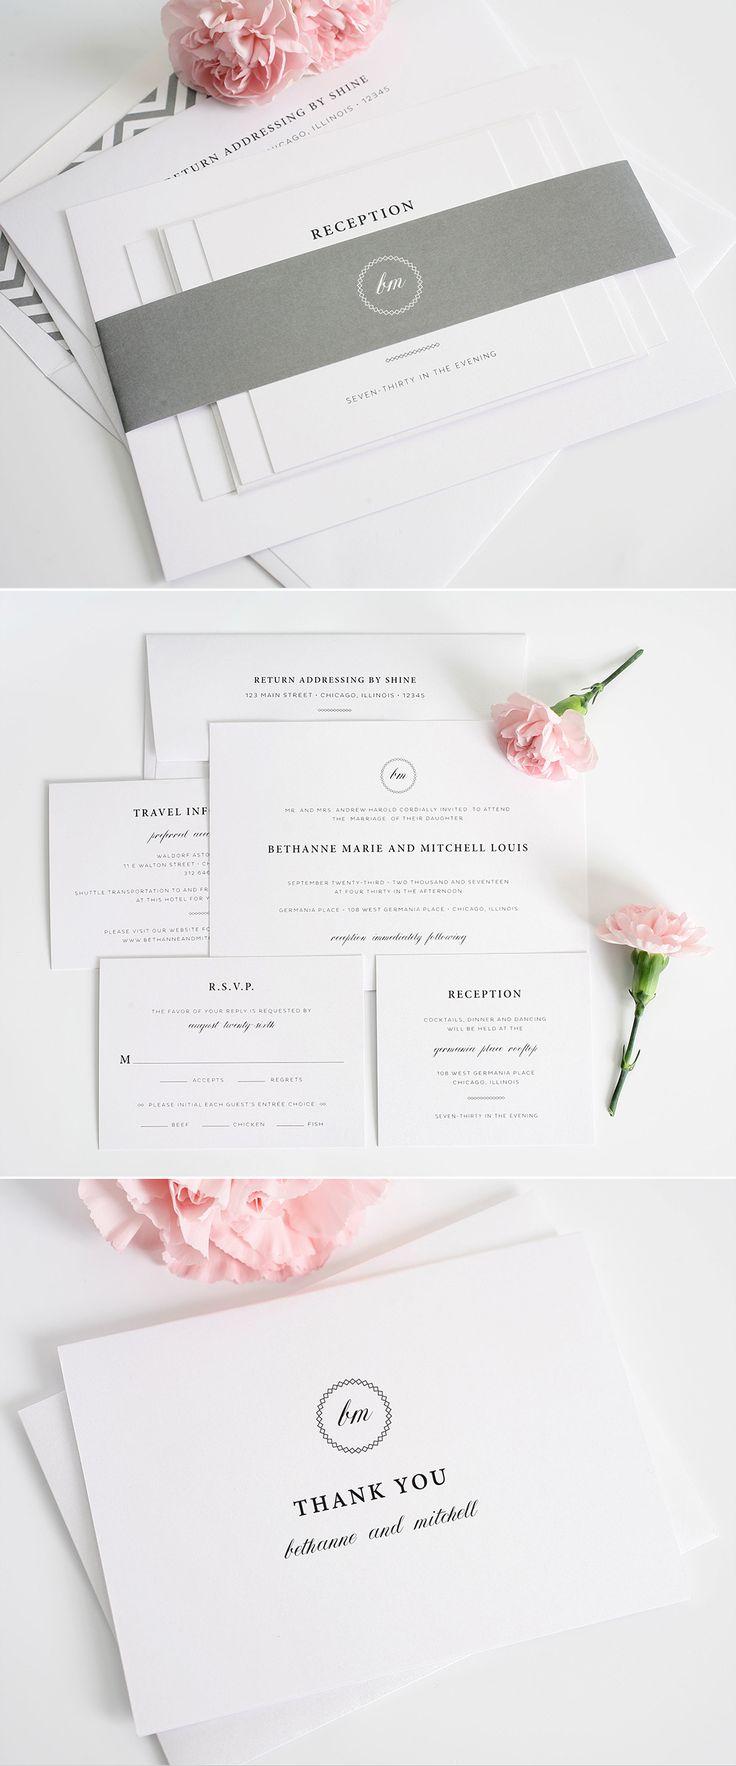 30 best Wedding Invitation Layouts images on Pinterest | Invitation ...